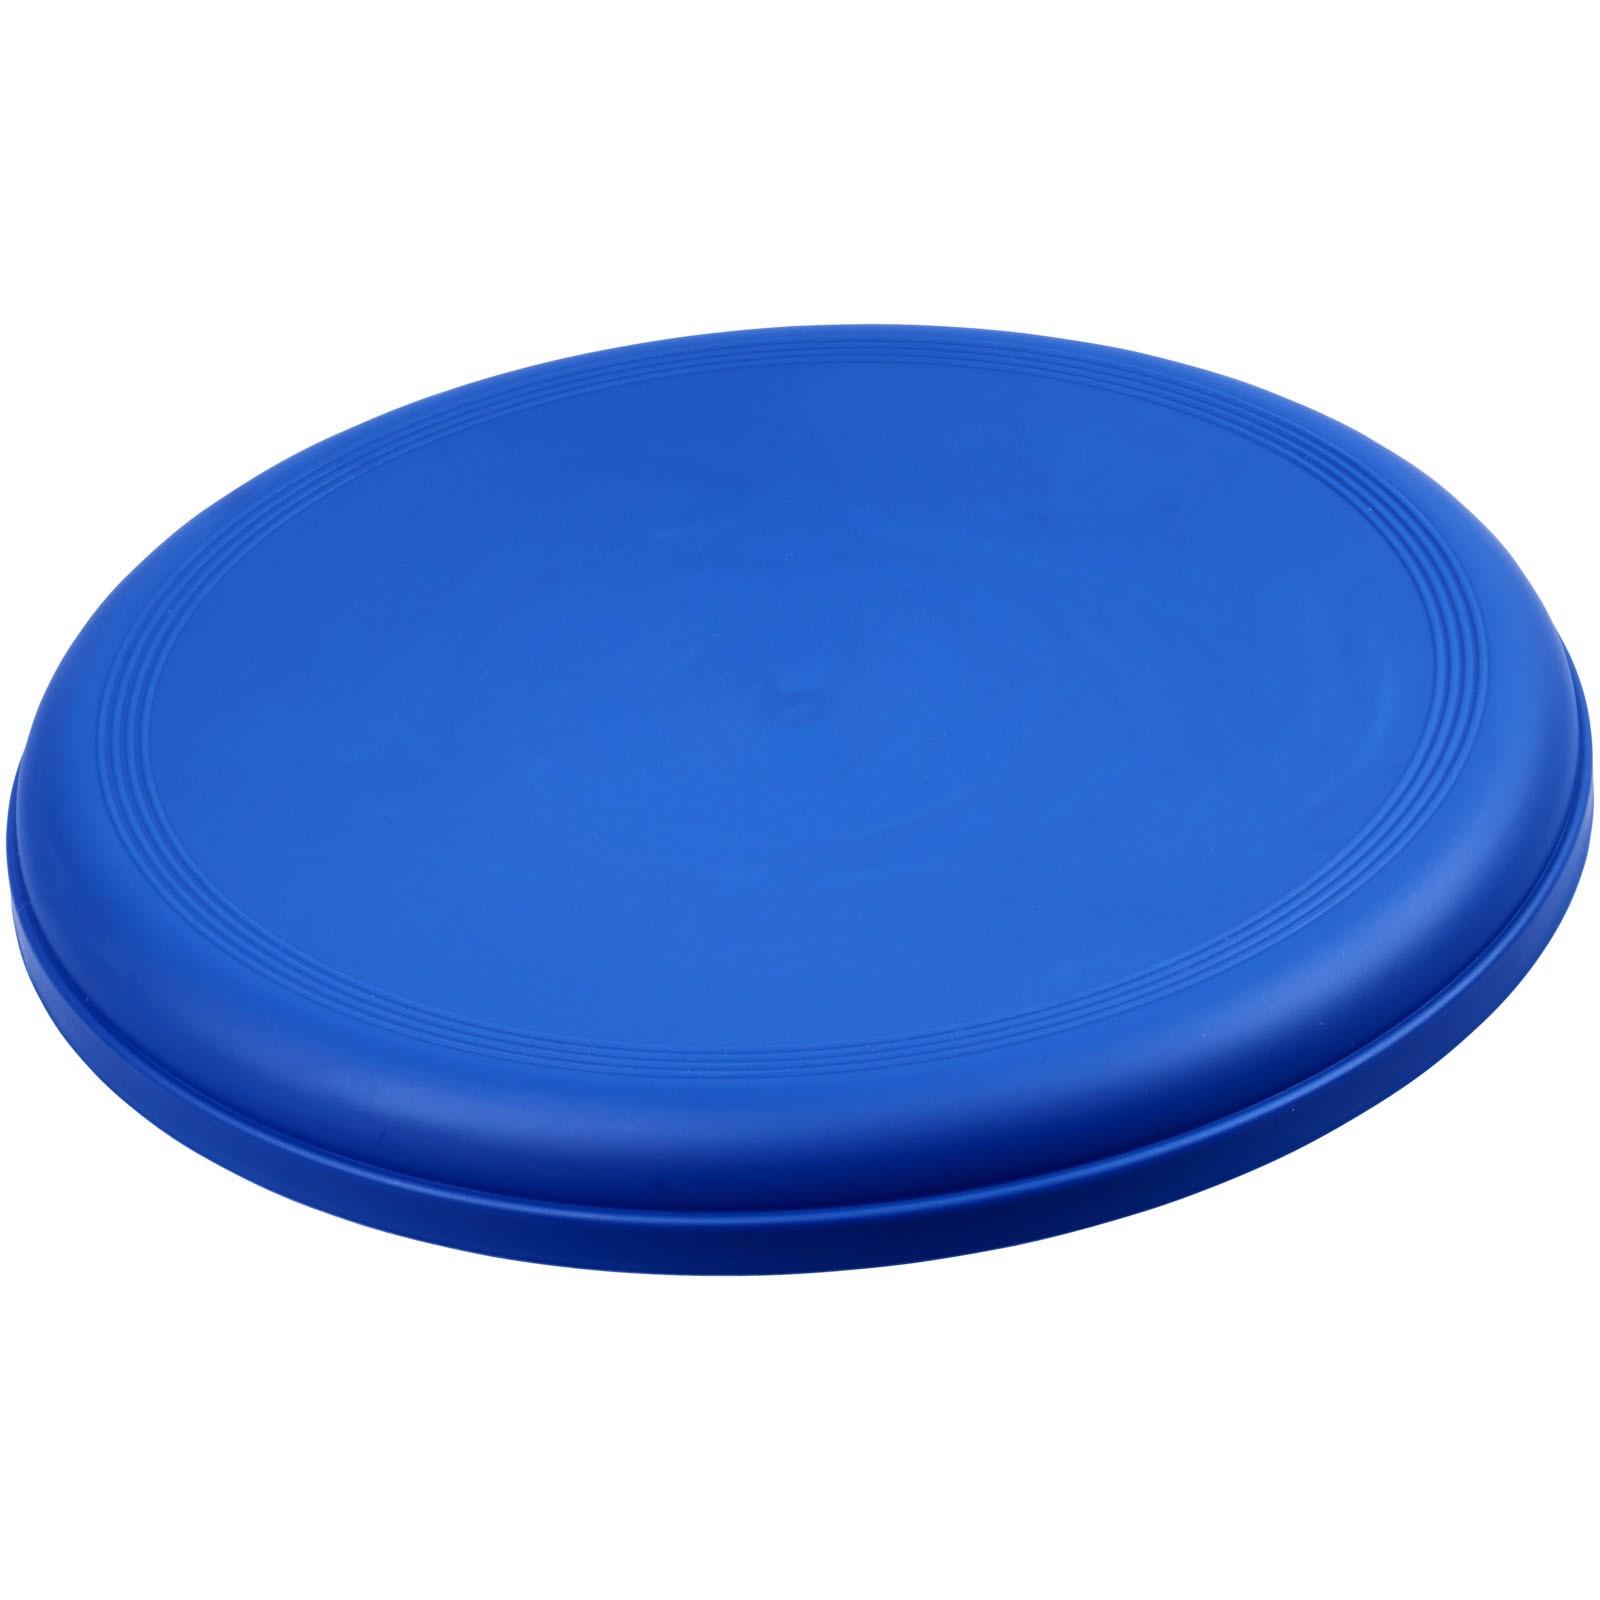 Frisbee Taurus - Světle modrá